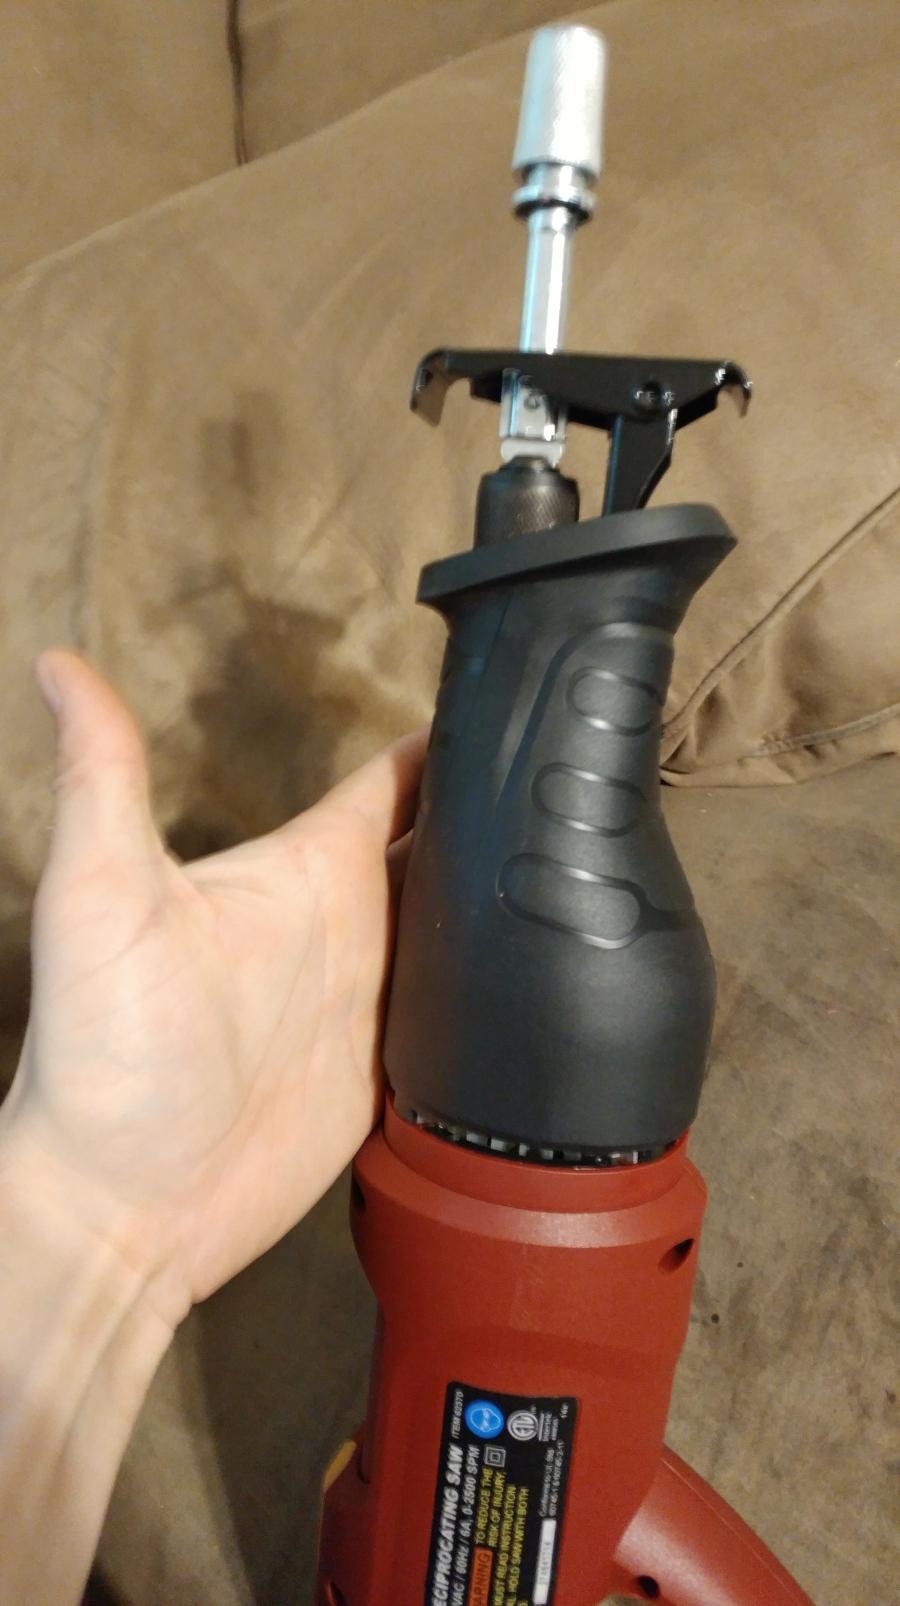 fuck saw assembling